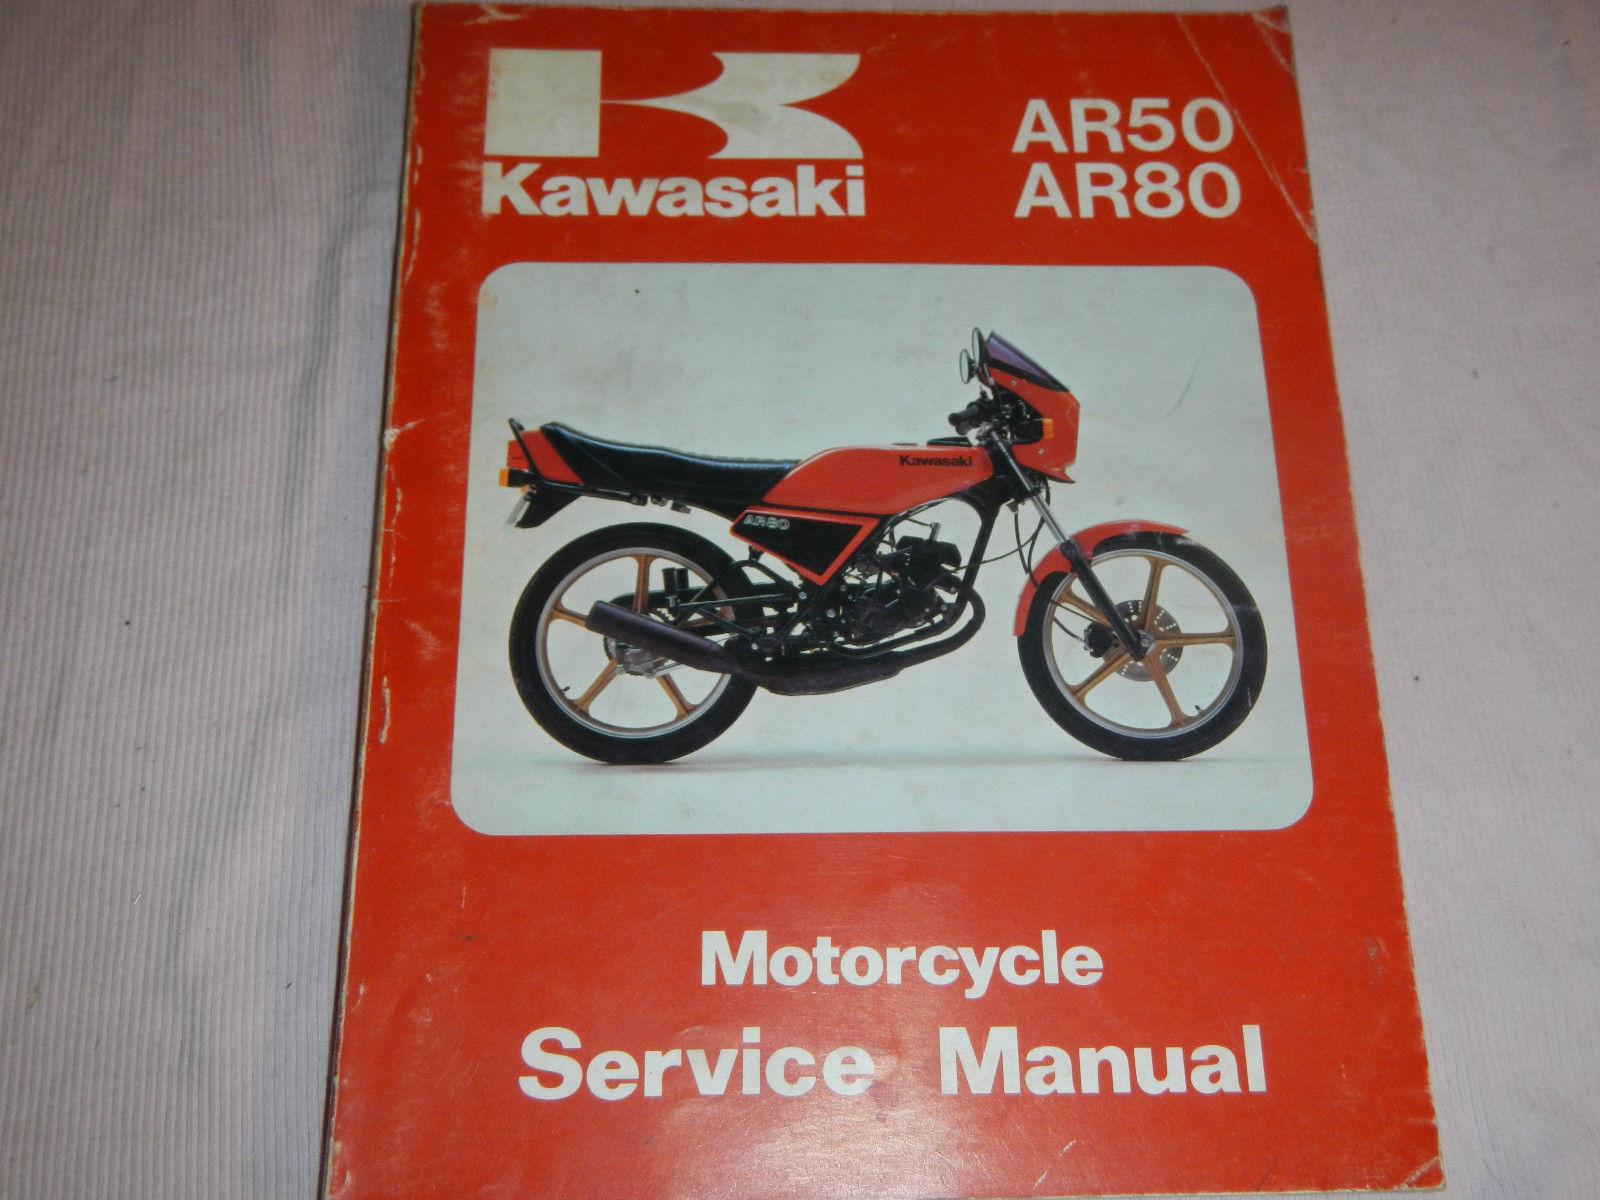 Kawasaki Ar 50 Wiring Diagram Not Lossing 95 750 Wire Library Rh 55 Skriptoase De 4 Wheeler